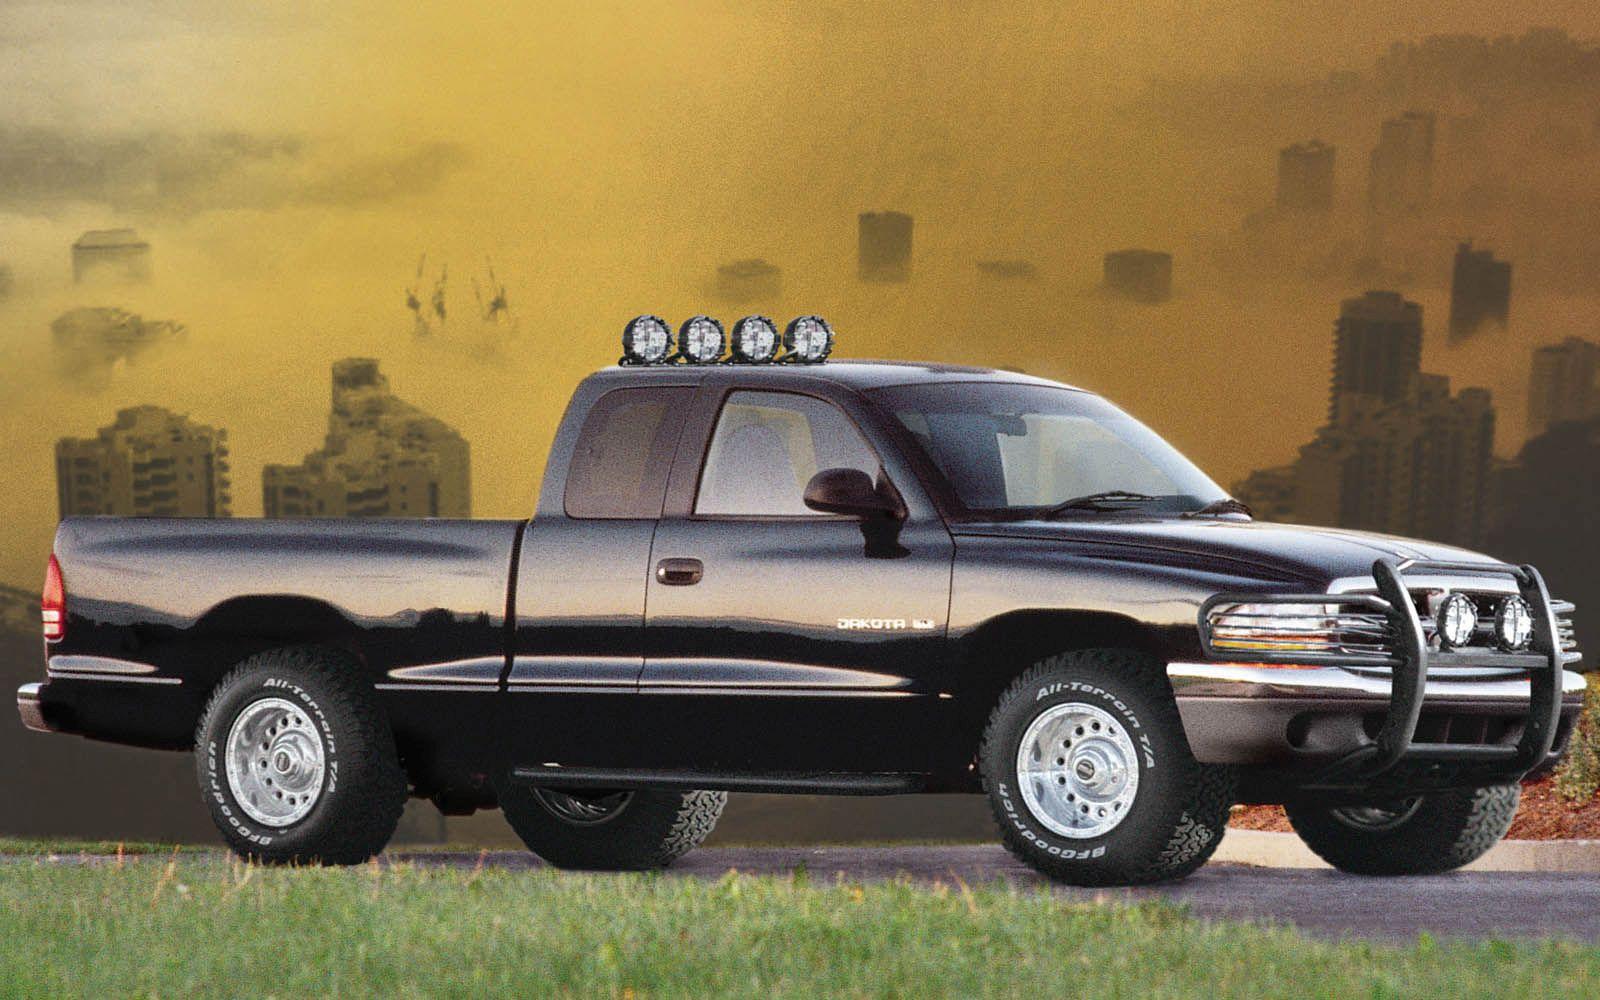 Dodge Dakota Extendedclub Cab Loaded Dual Inch W Rms Ohm Vehicle Specific Custom Enclosure on 95 Dodge Dakota Extended Cab